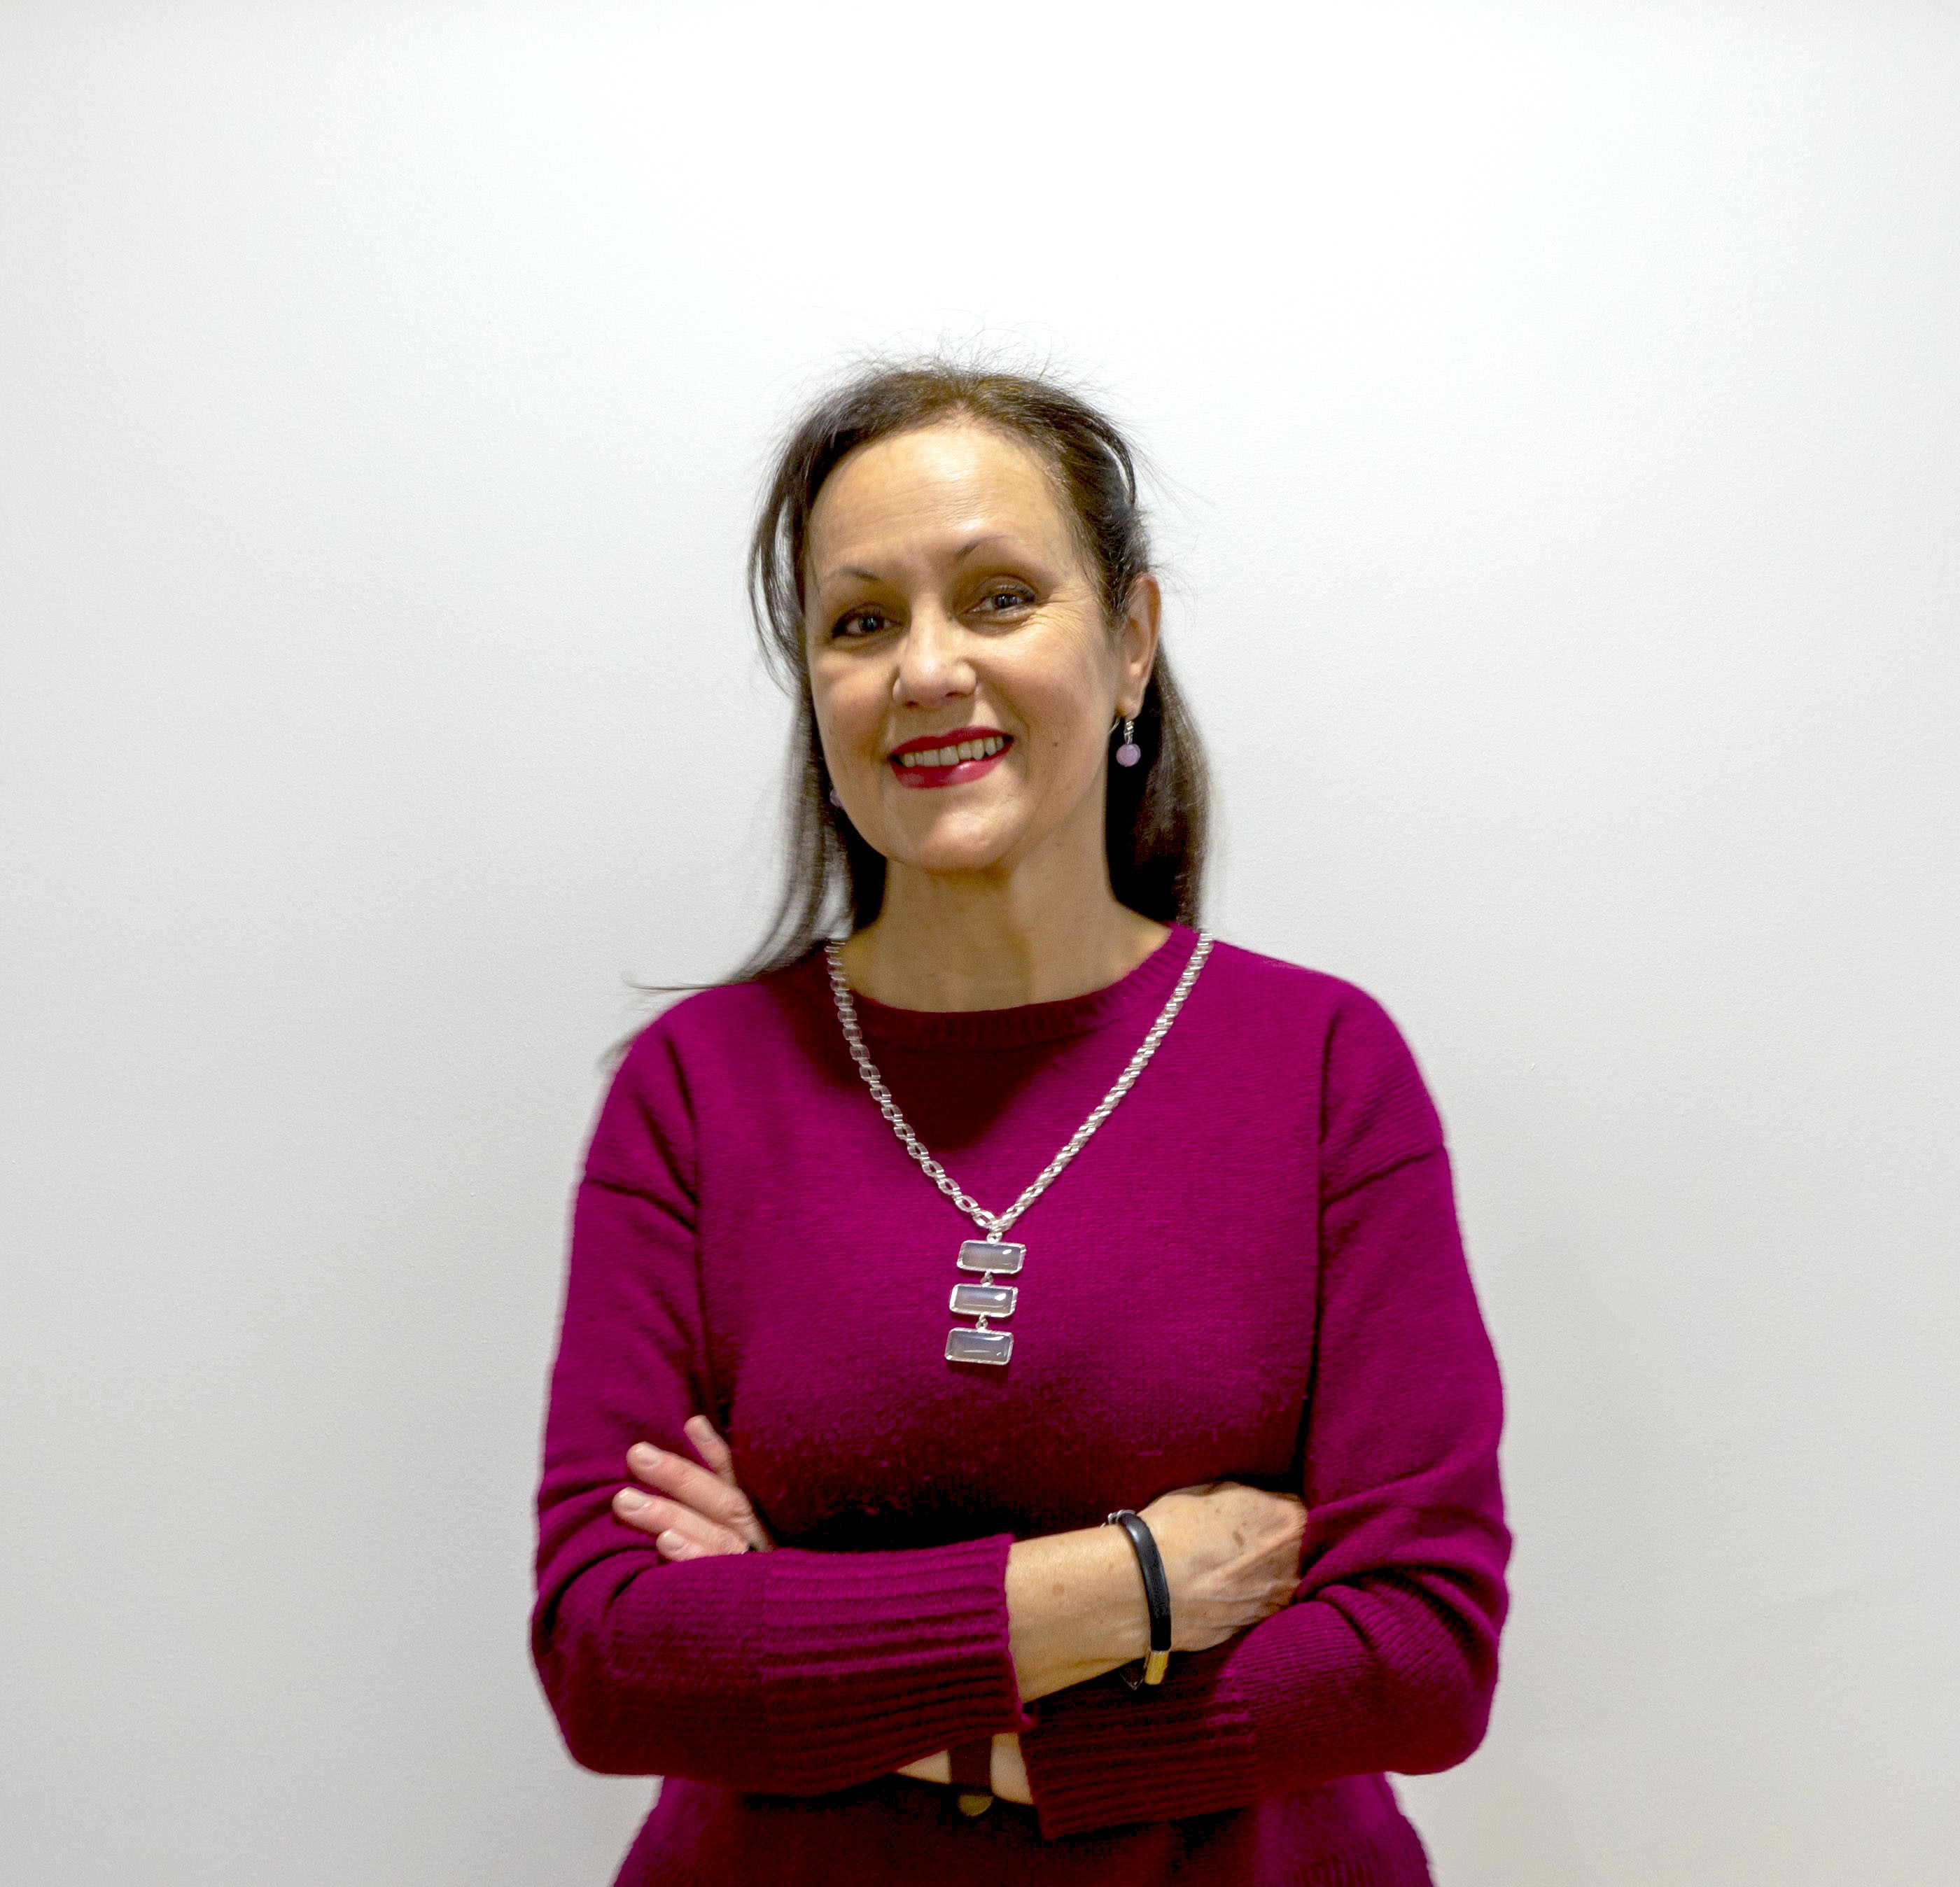 Maria Ángeles Hernández Hernández